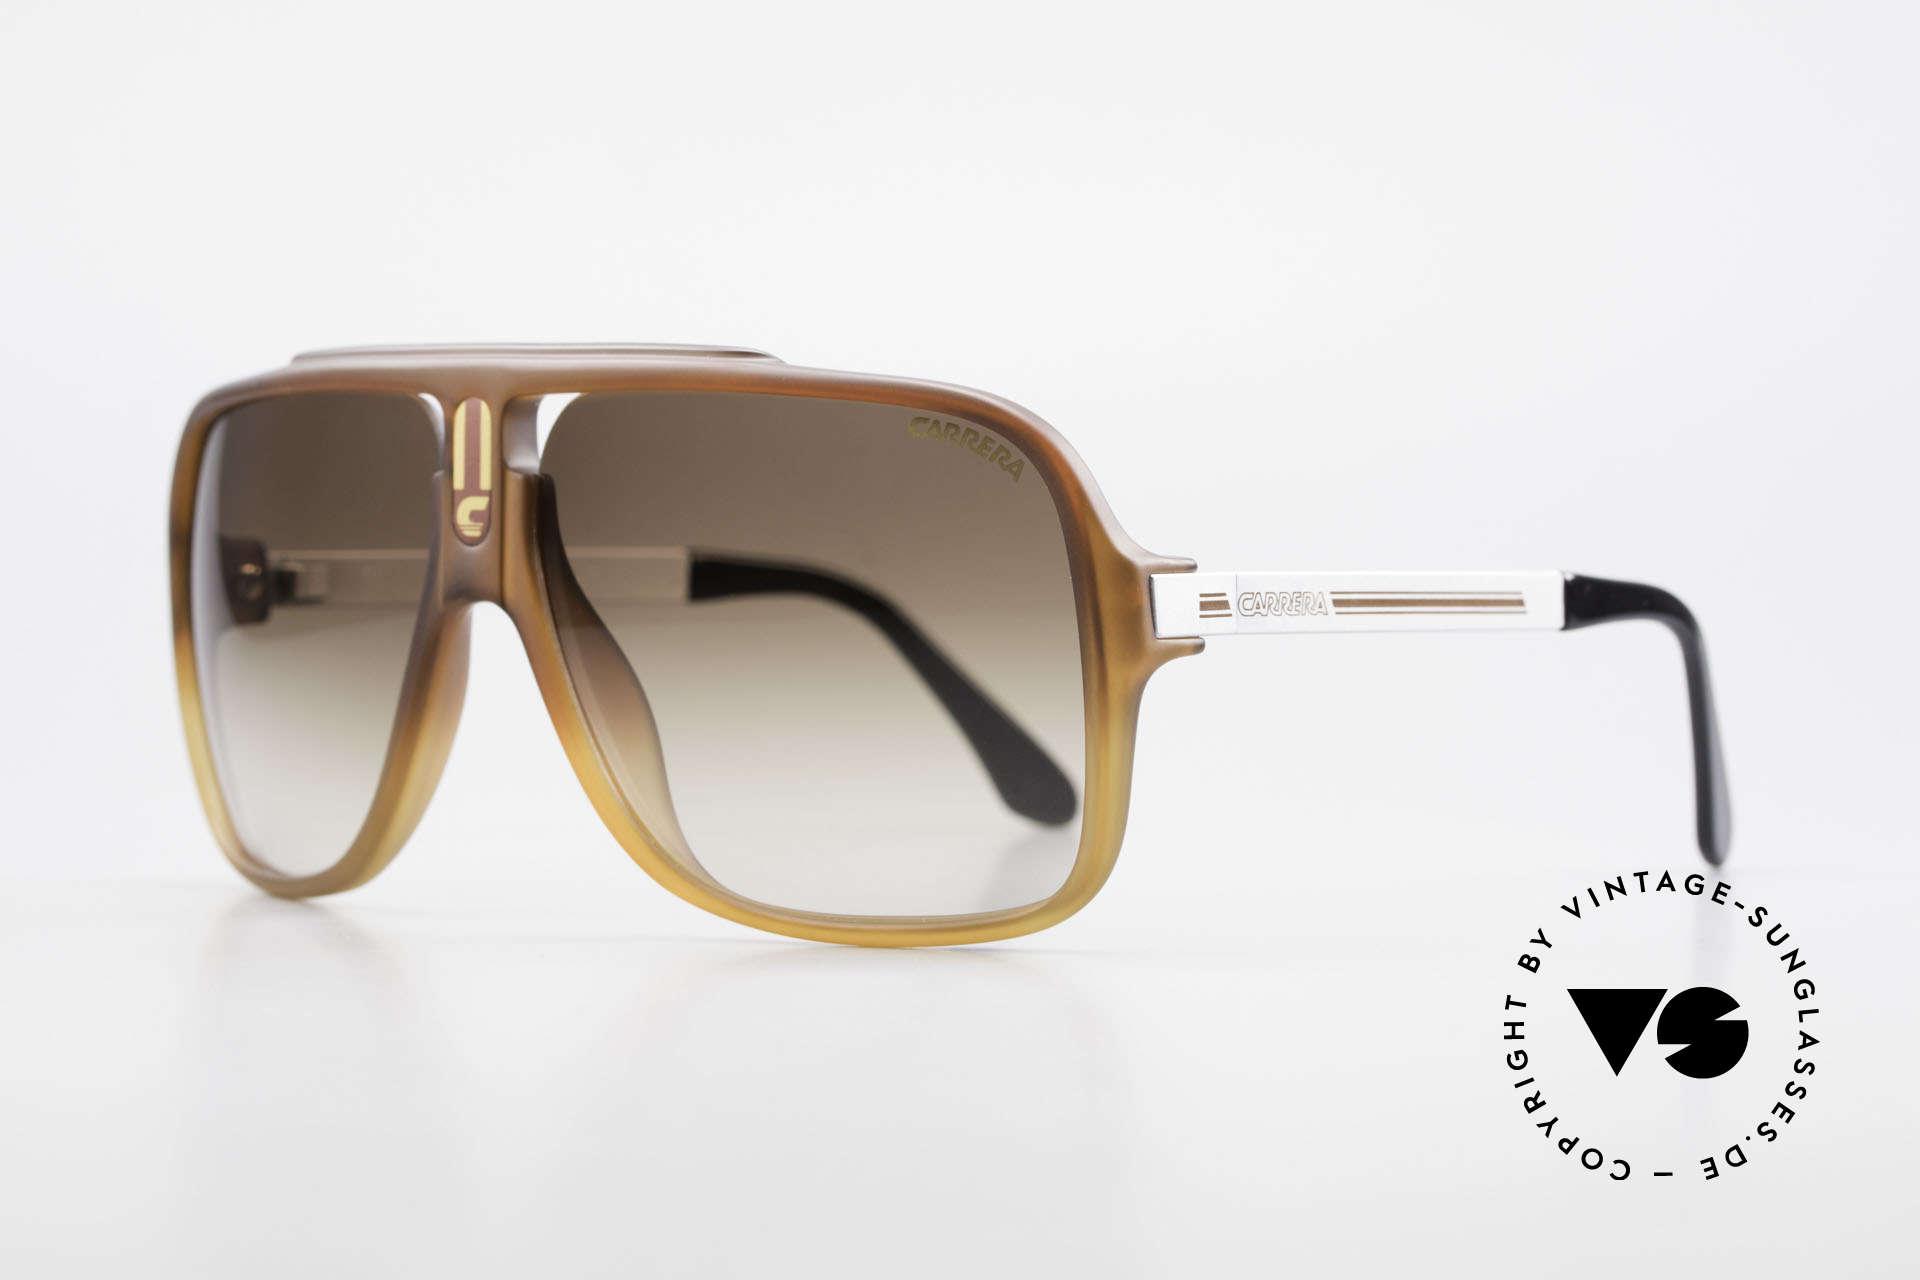 Carrera 5557 Rare Vintage Shades No Retro, men's shades with brown-gradient lenses (100% UV), Made for Men